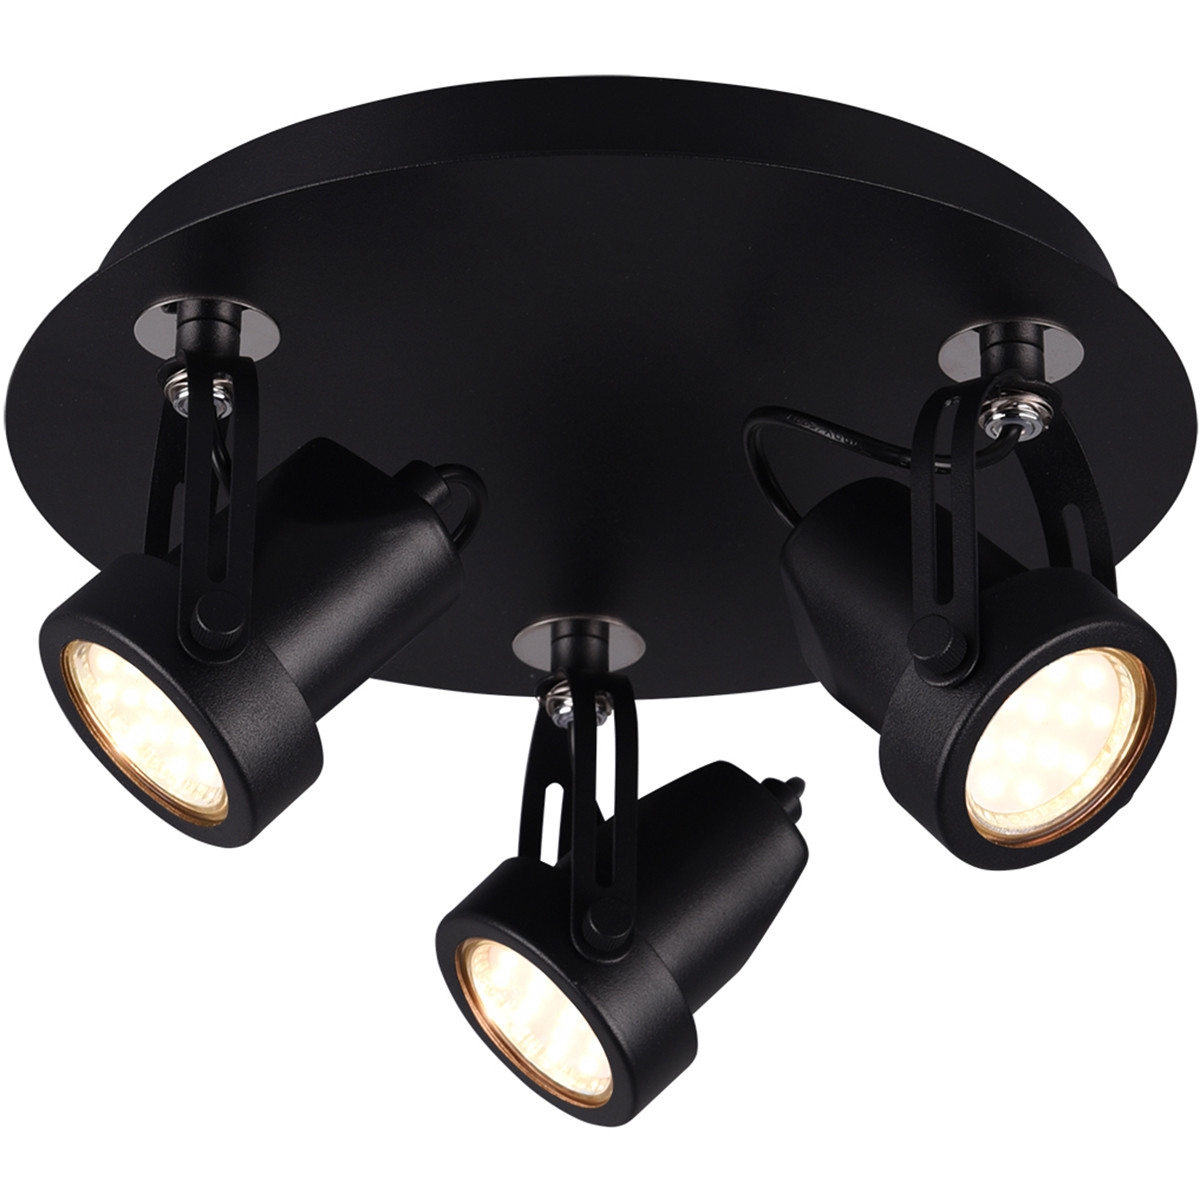 LED Plafondspot - Trion Guno - GU10 Fitting - 3-lichts - Rond - Mat Zwart - Aluminium